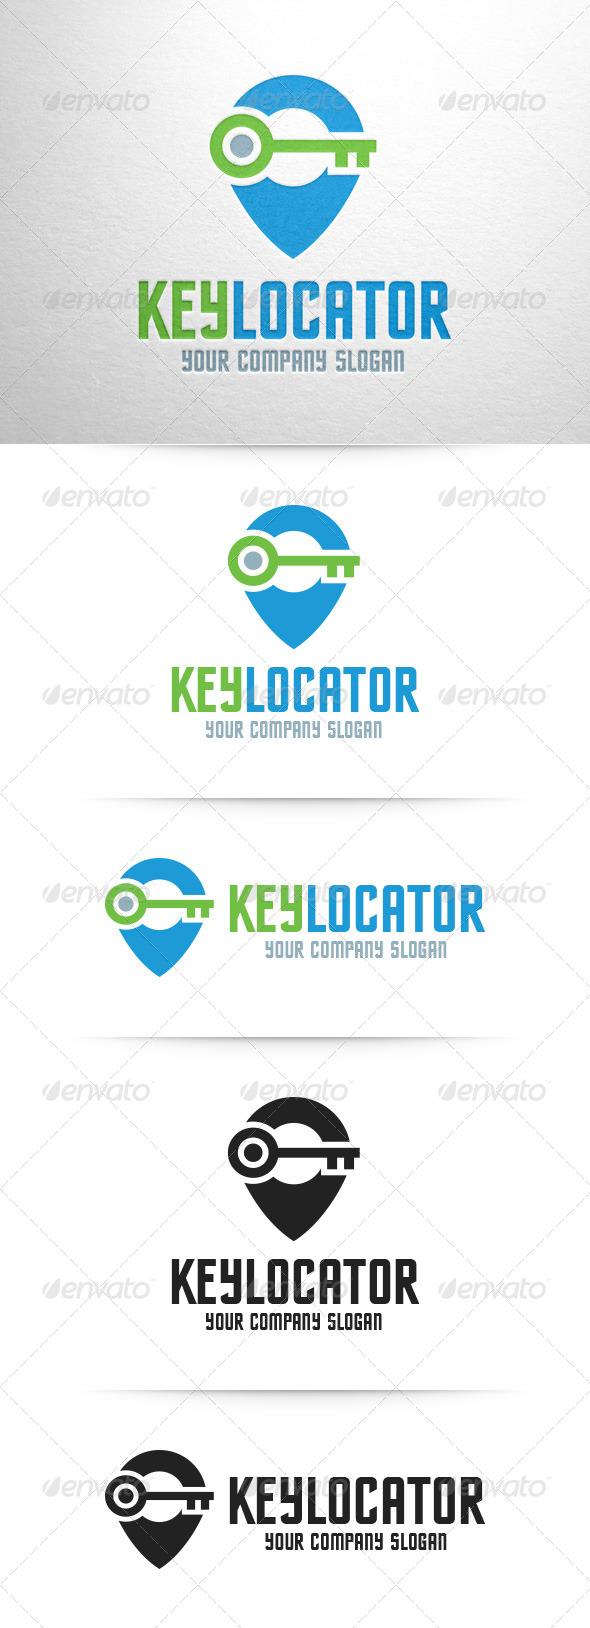 GraphicRiver Key Locator Logo Template 8349639